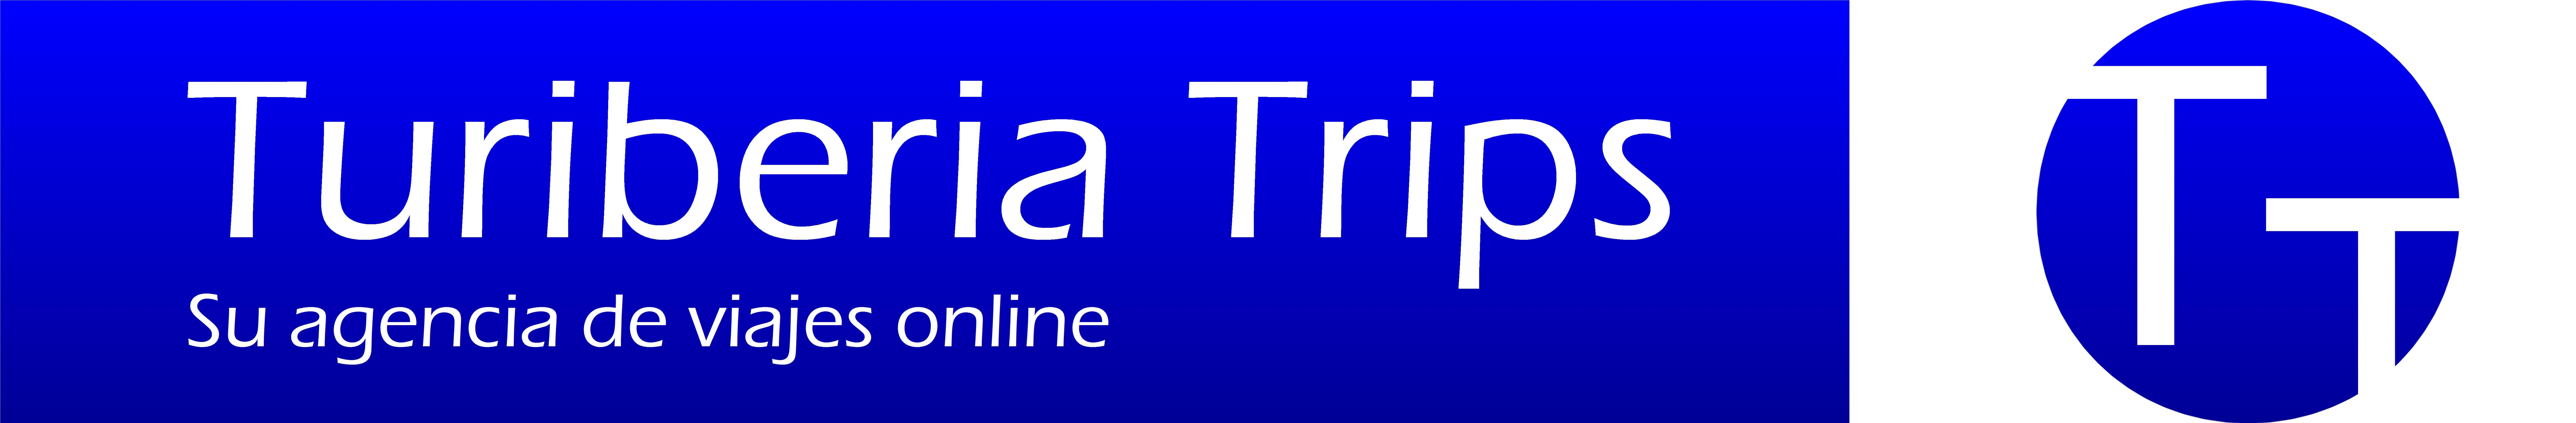 Logo de Turiberia Trips 2400ppp